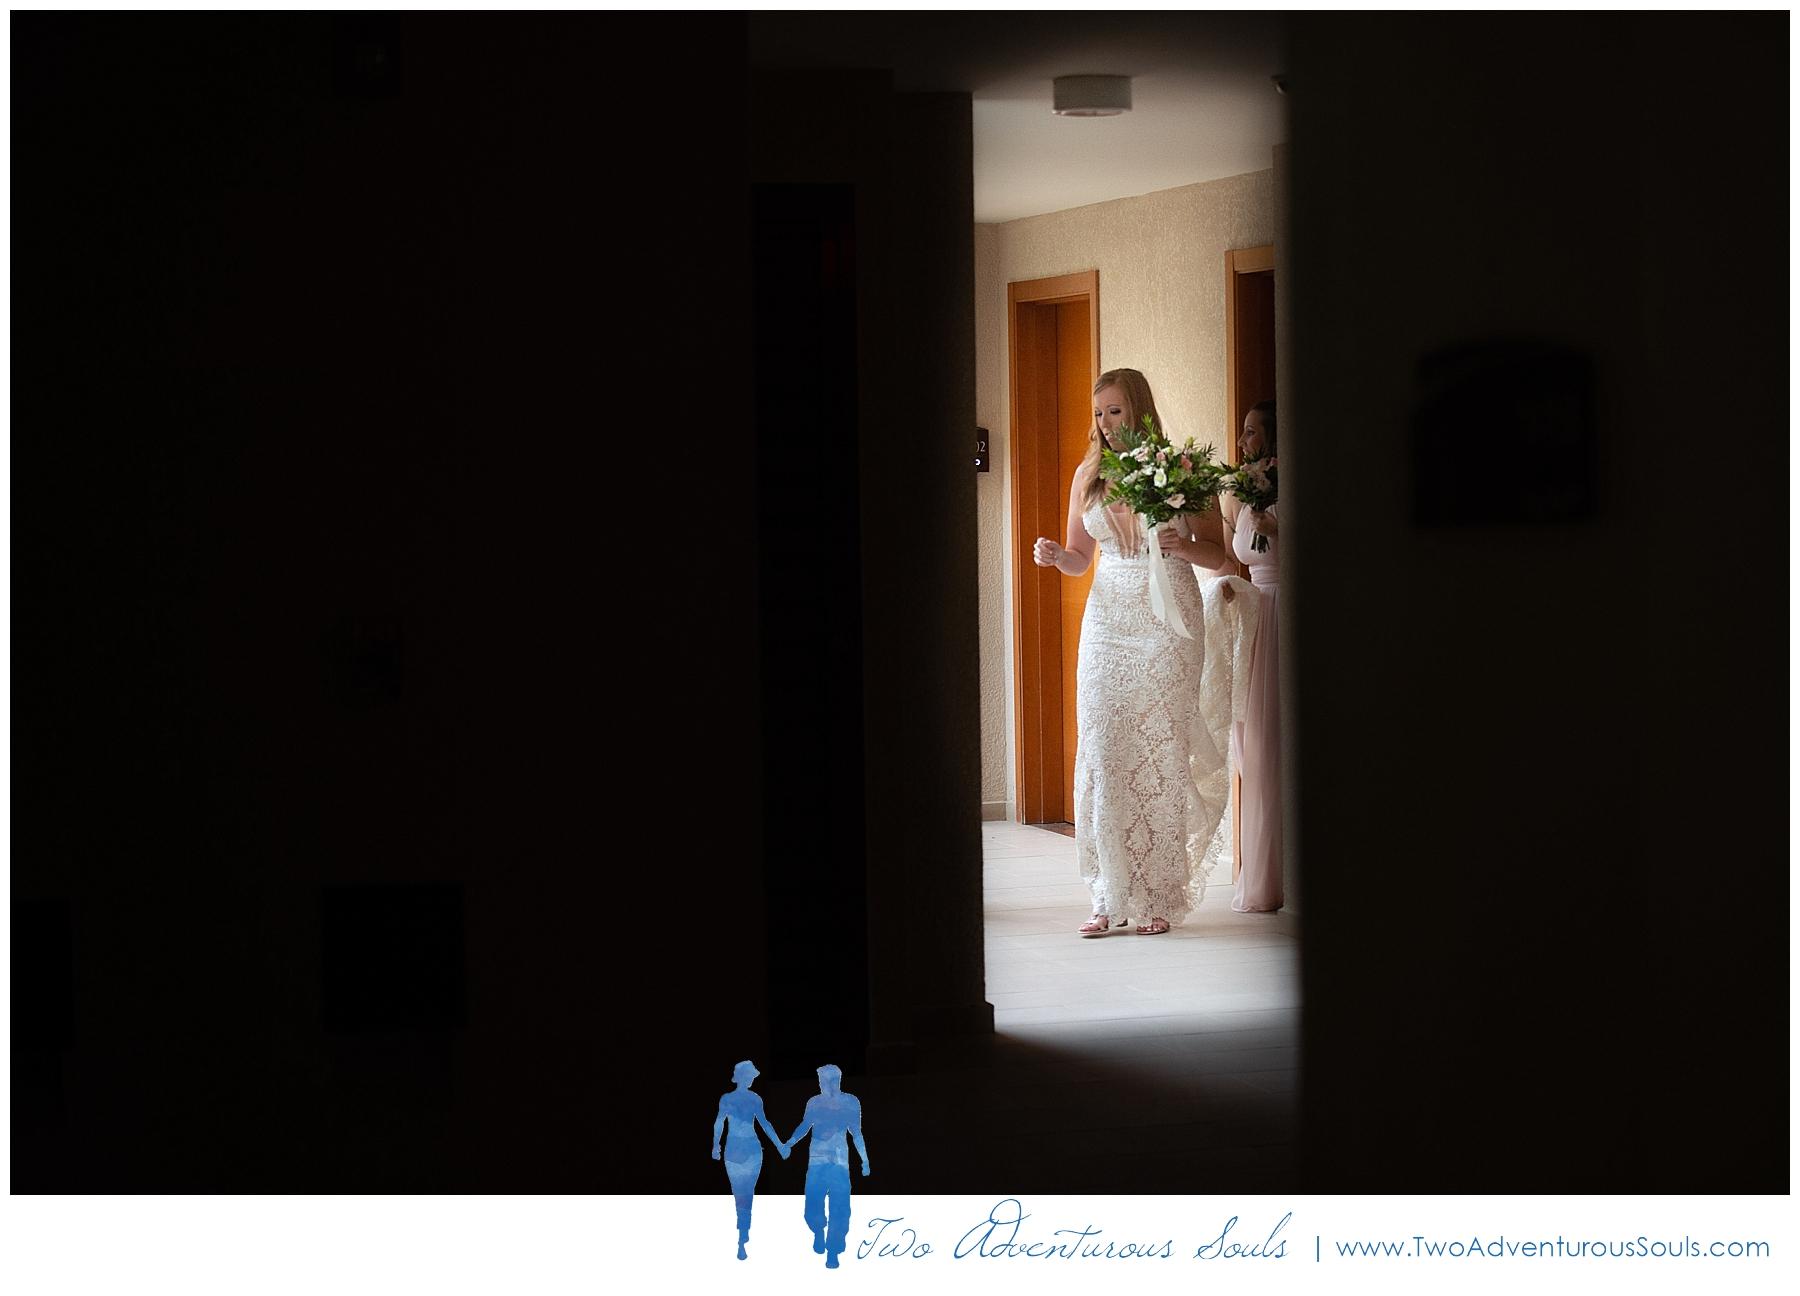 Costa Rica Wedding Photographers, Dreams las Mareas Wedding, Destination Wedding Photographers, Two Adventurous Souls - 022219_0016.jpg